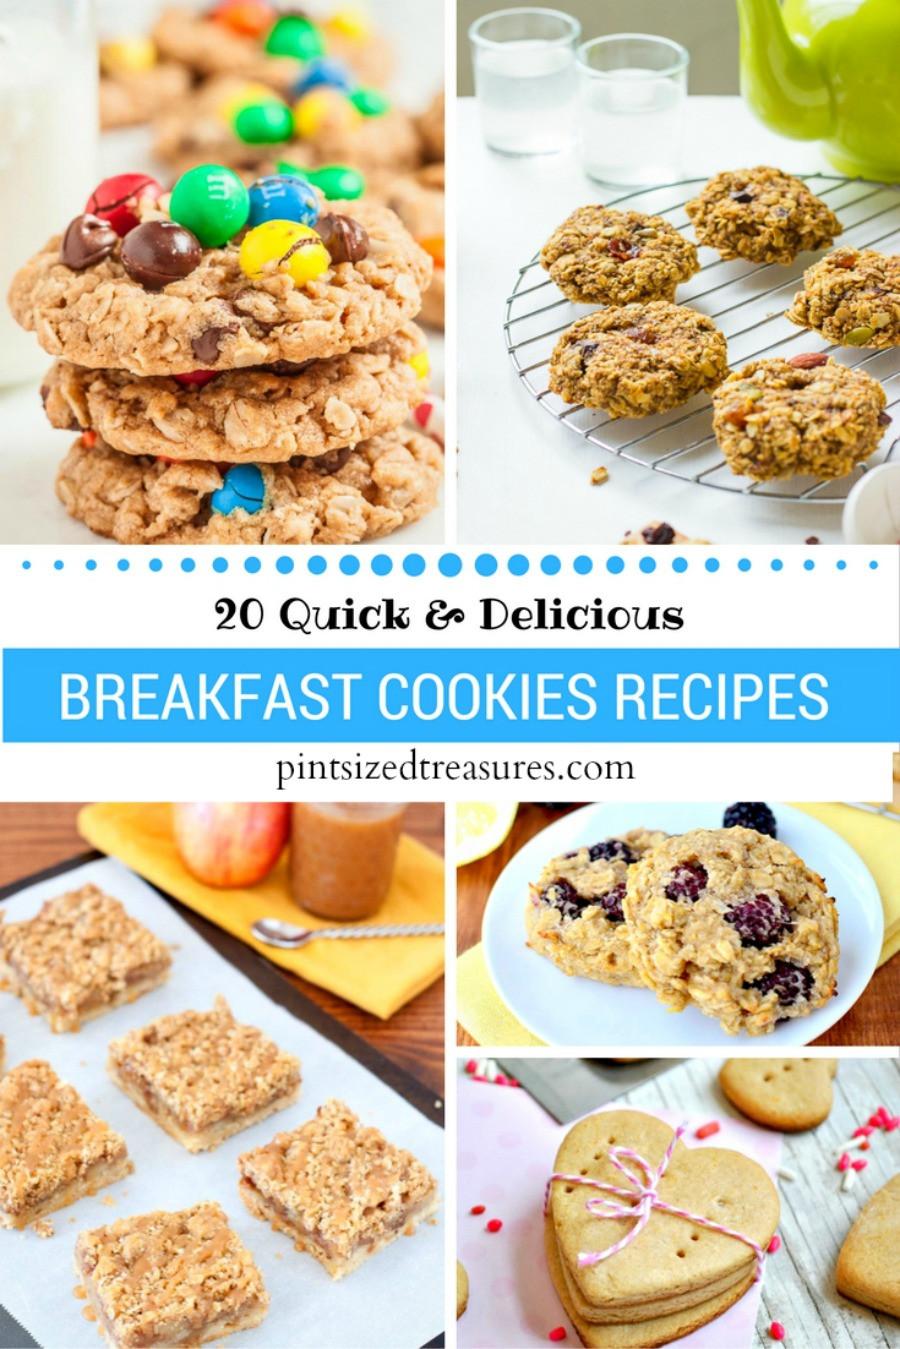 Breakfast Cookie Recipes  20 Quick Breakfast Cookie Recipes · Pint sized Treasures